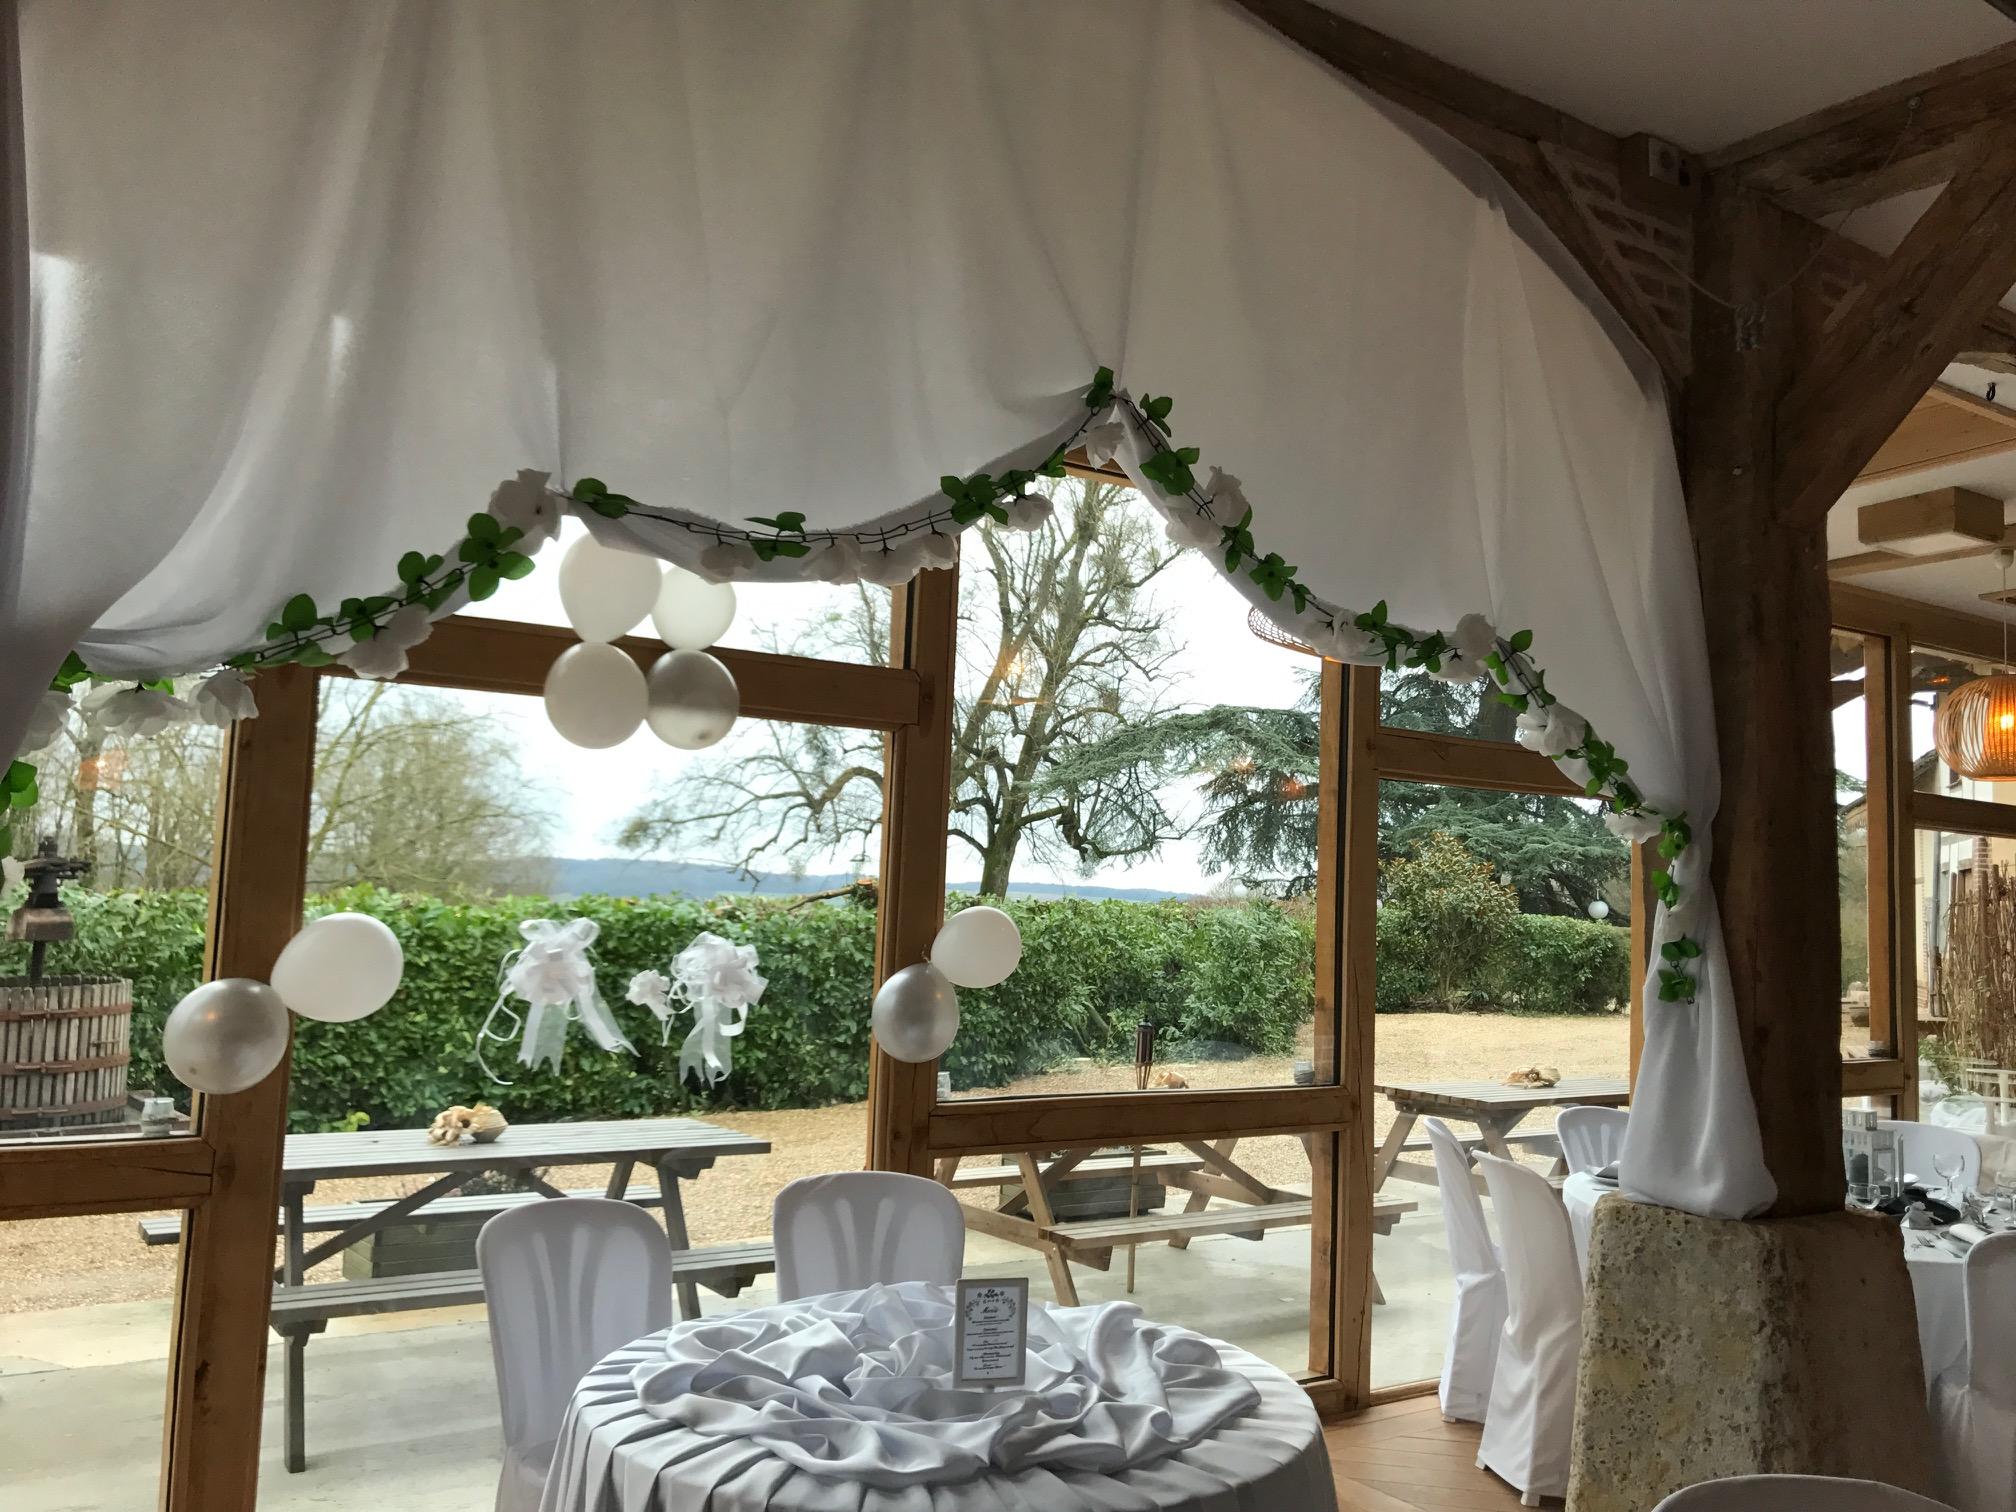 rubric __ decorations __ winter wedding __ Site 1001 salle __ IMG_6631.JPG